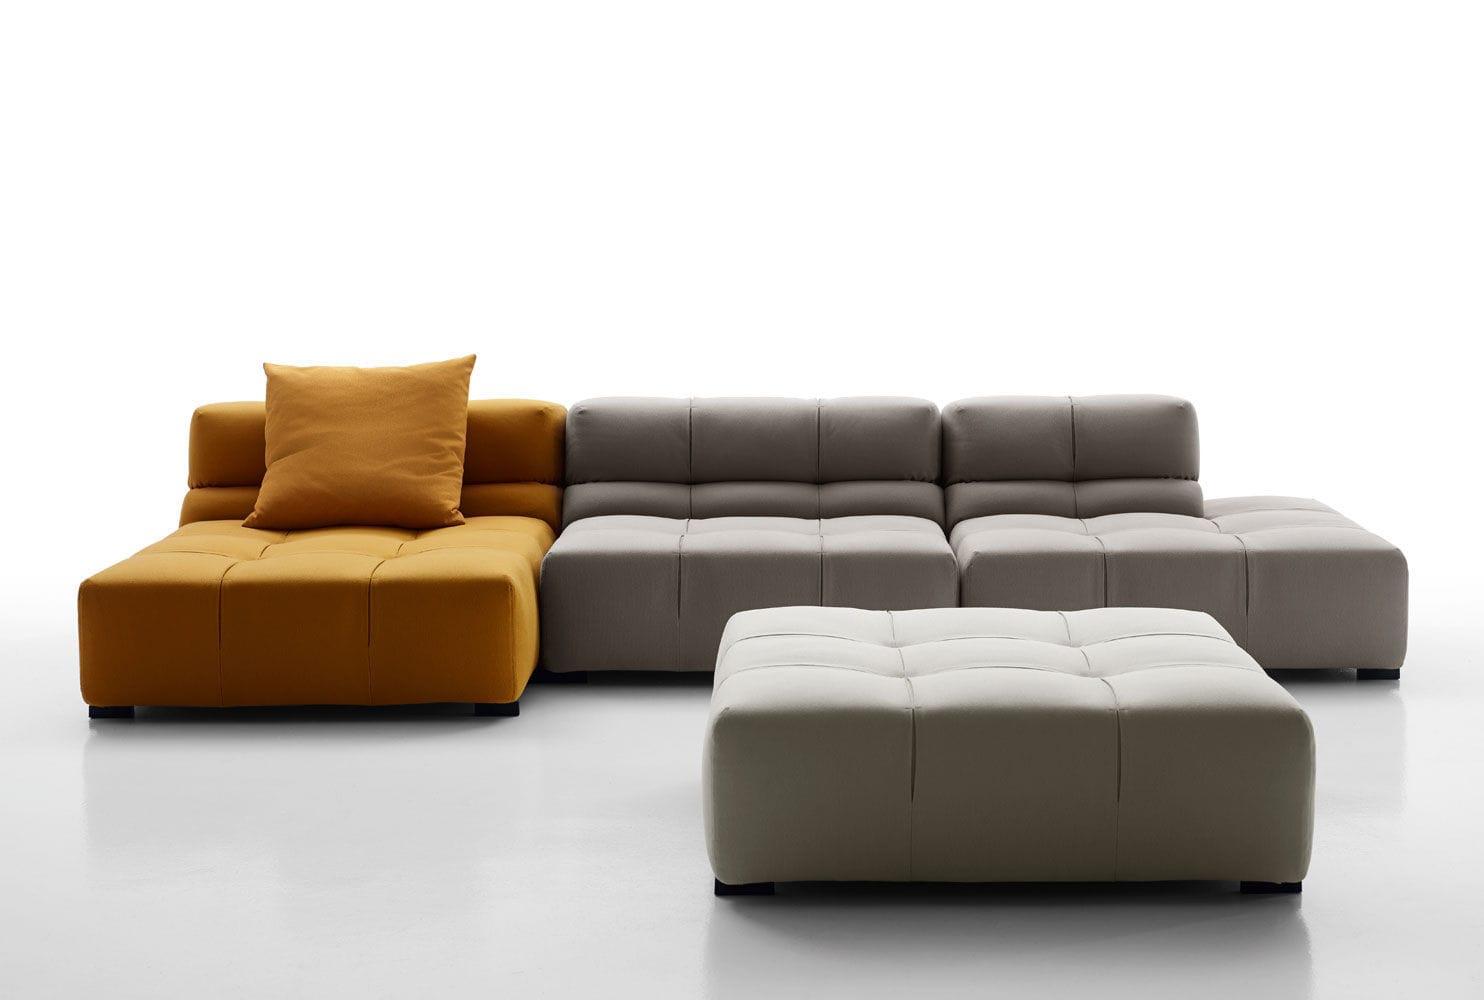 Modular Sofa Tufty Time 15 B